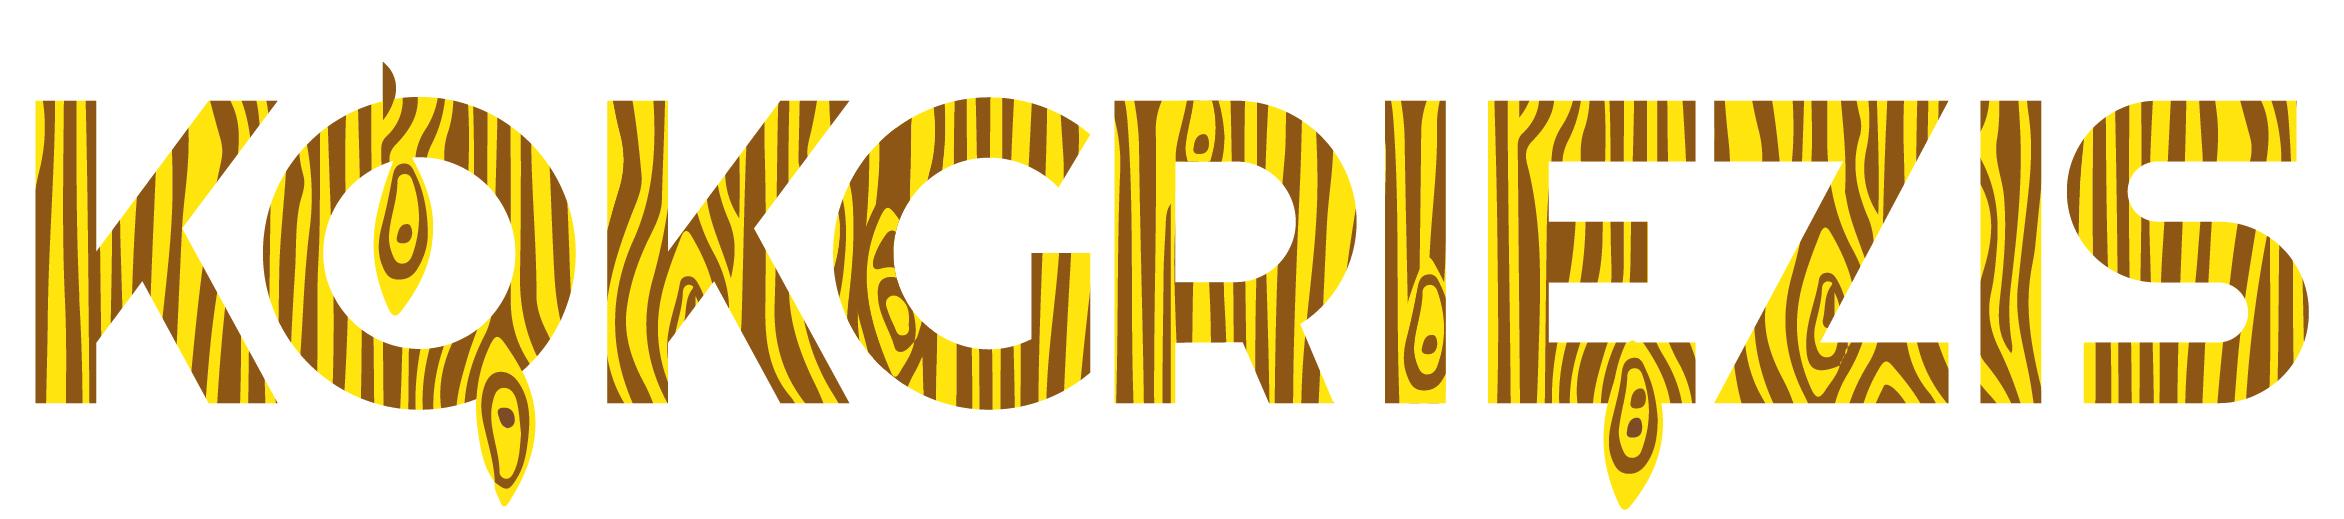 kokgr-logo-01